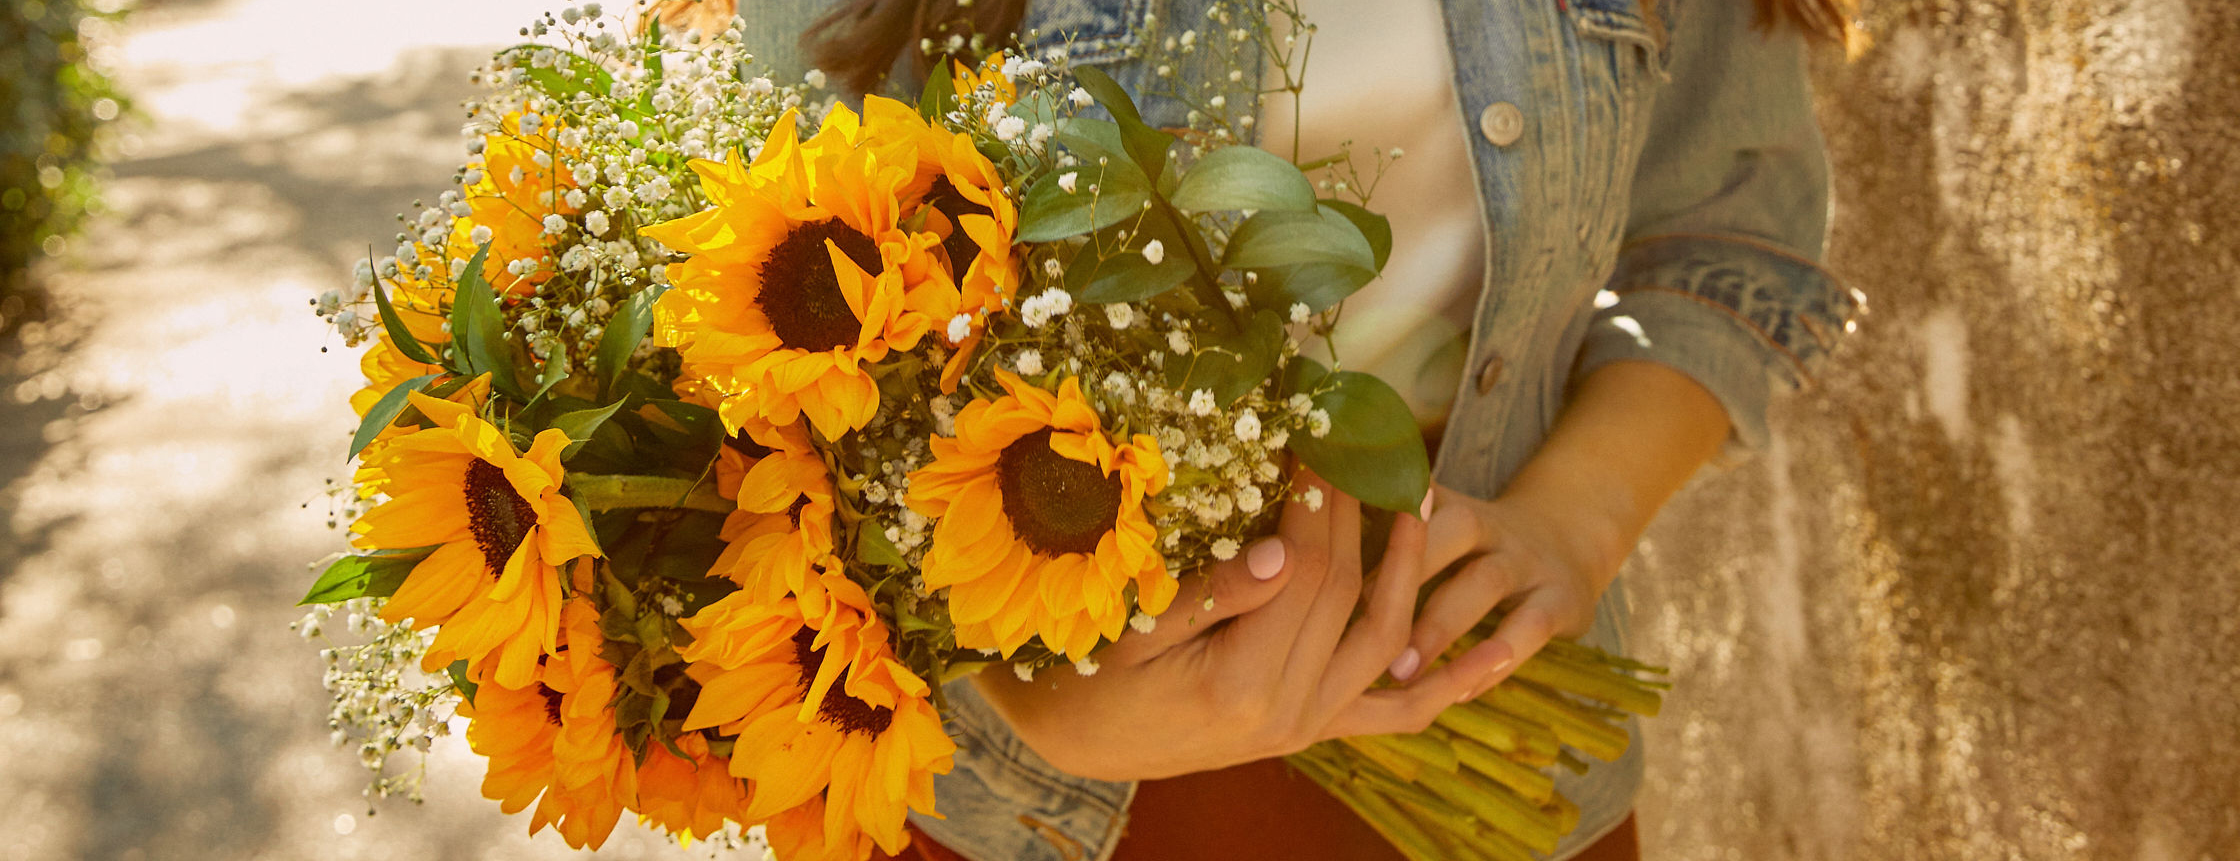 Woman holding sunflower bouquet at golden hour